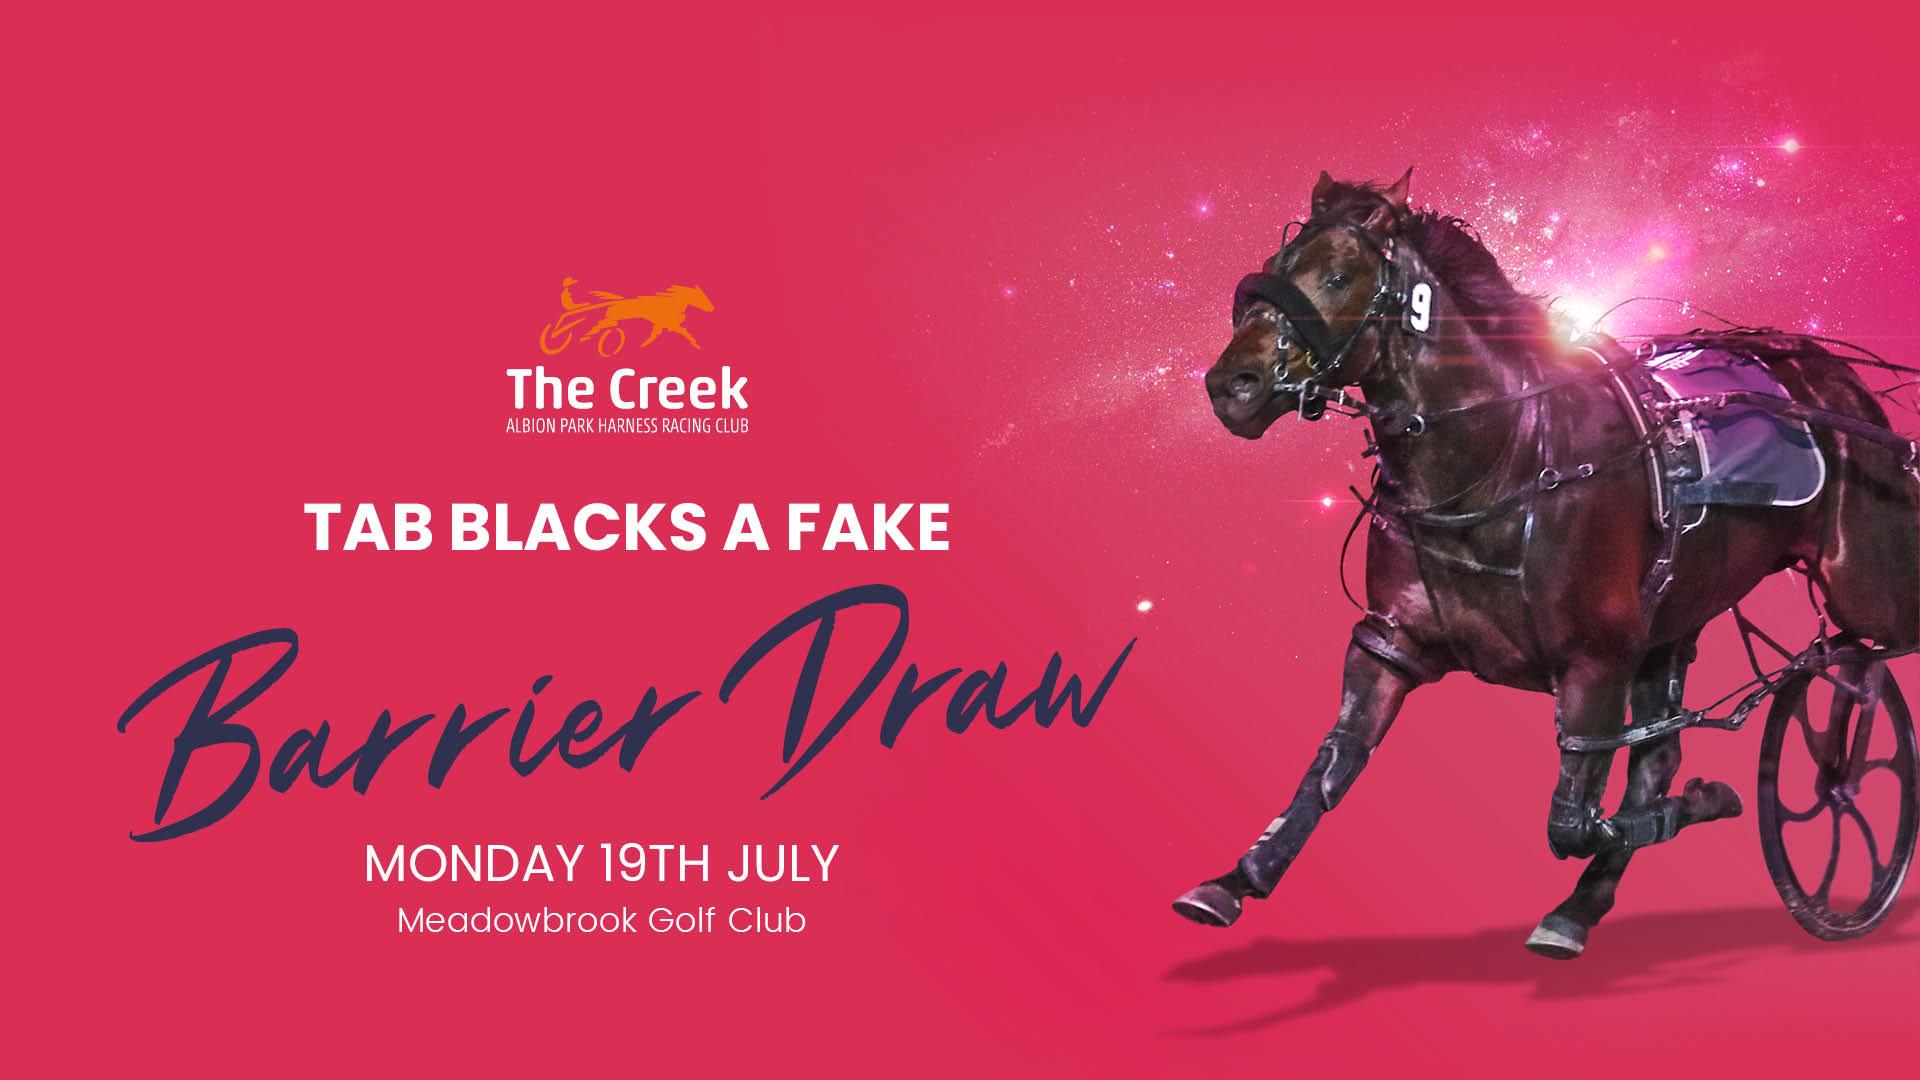 3724Barrier Draw – TAB Blacks A Fake